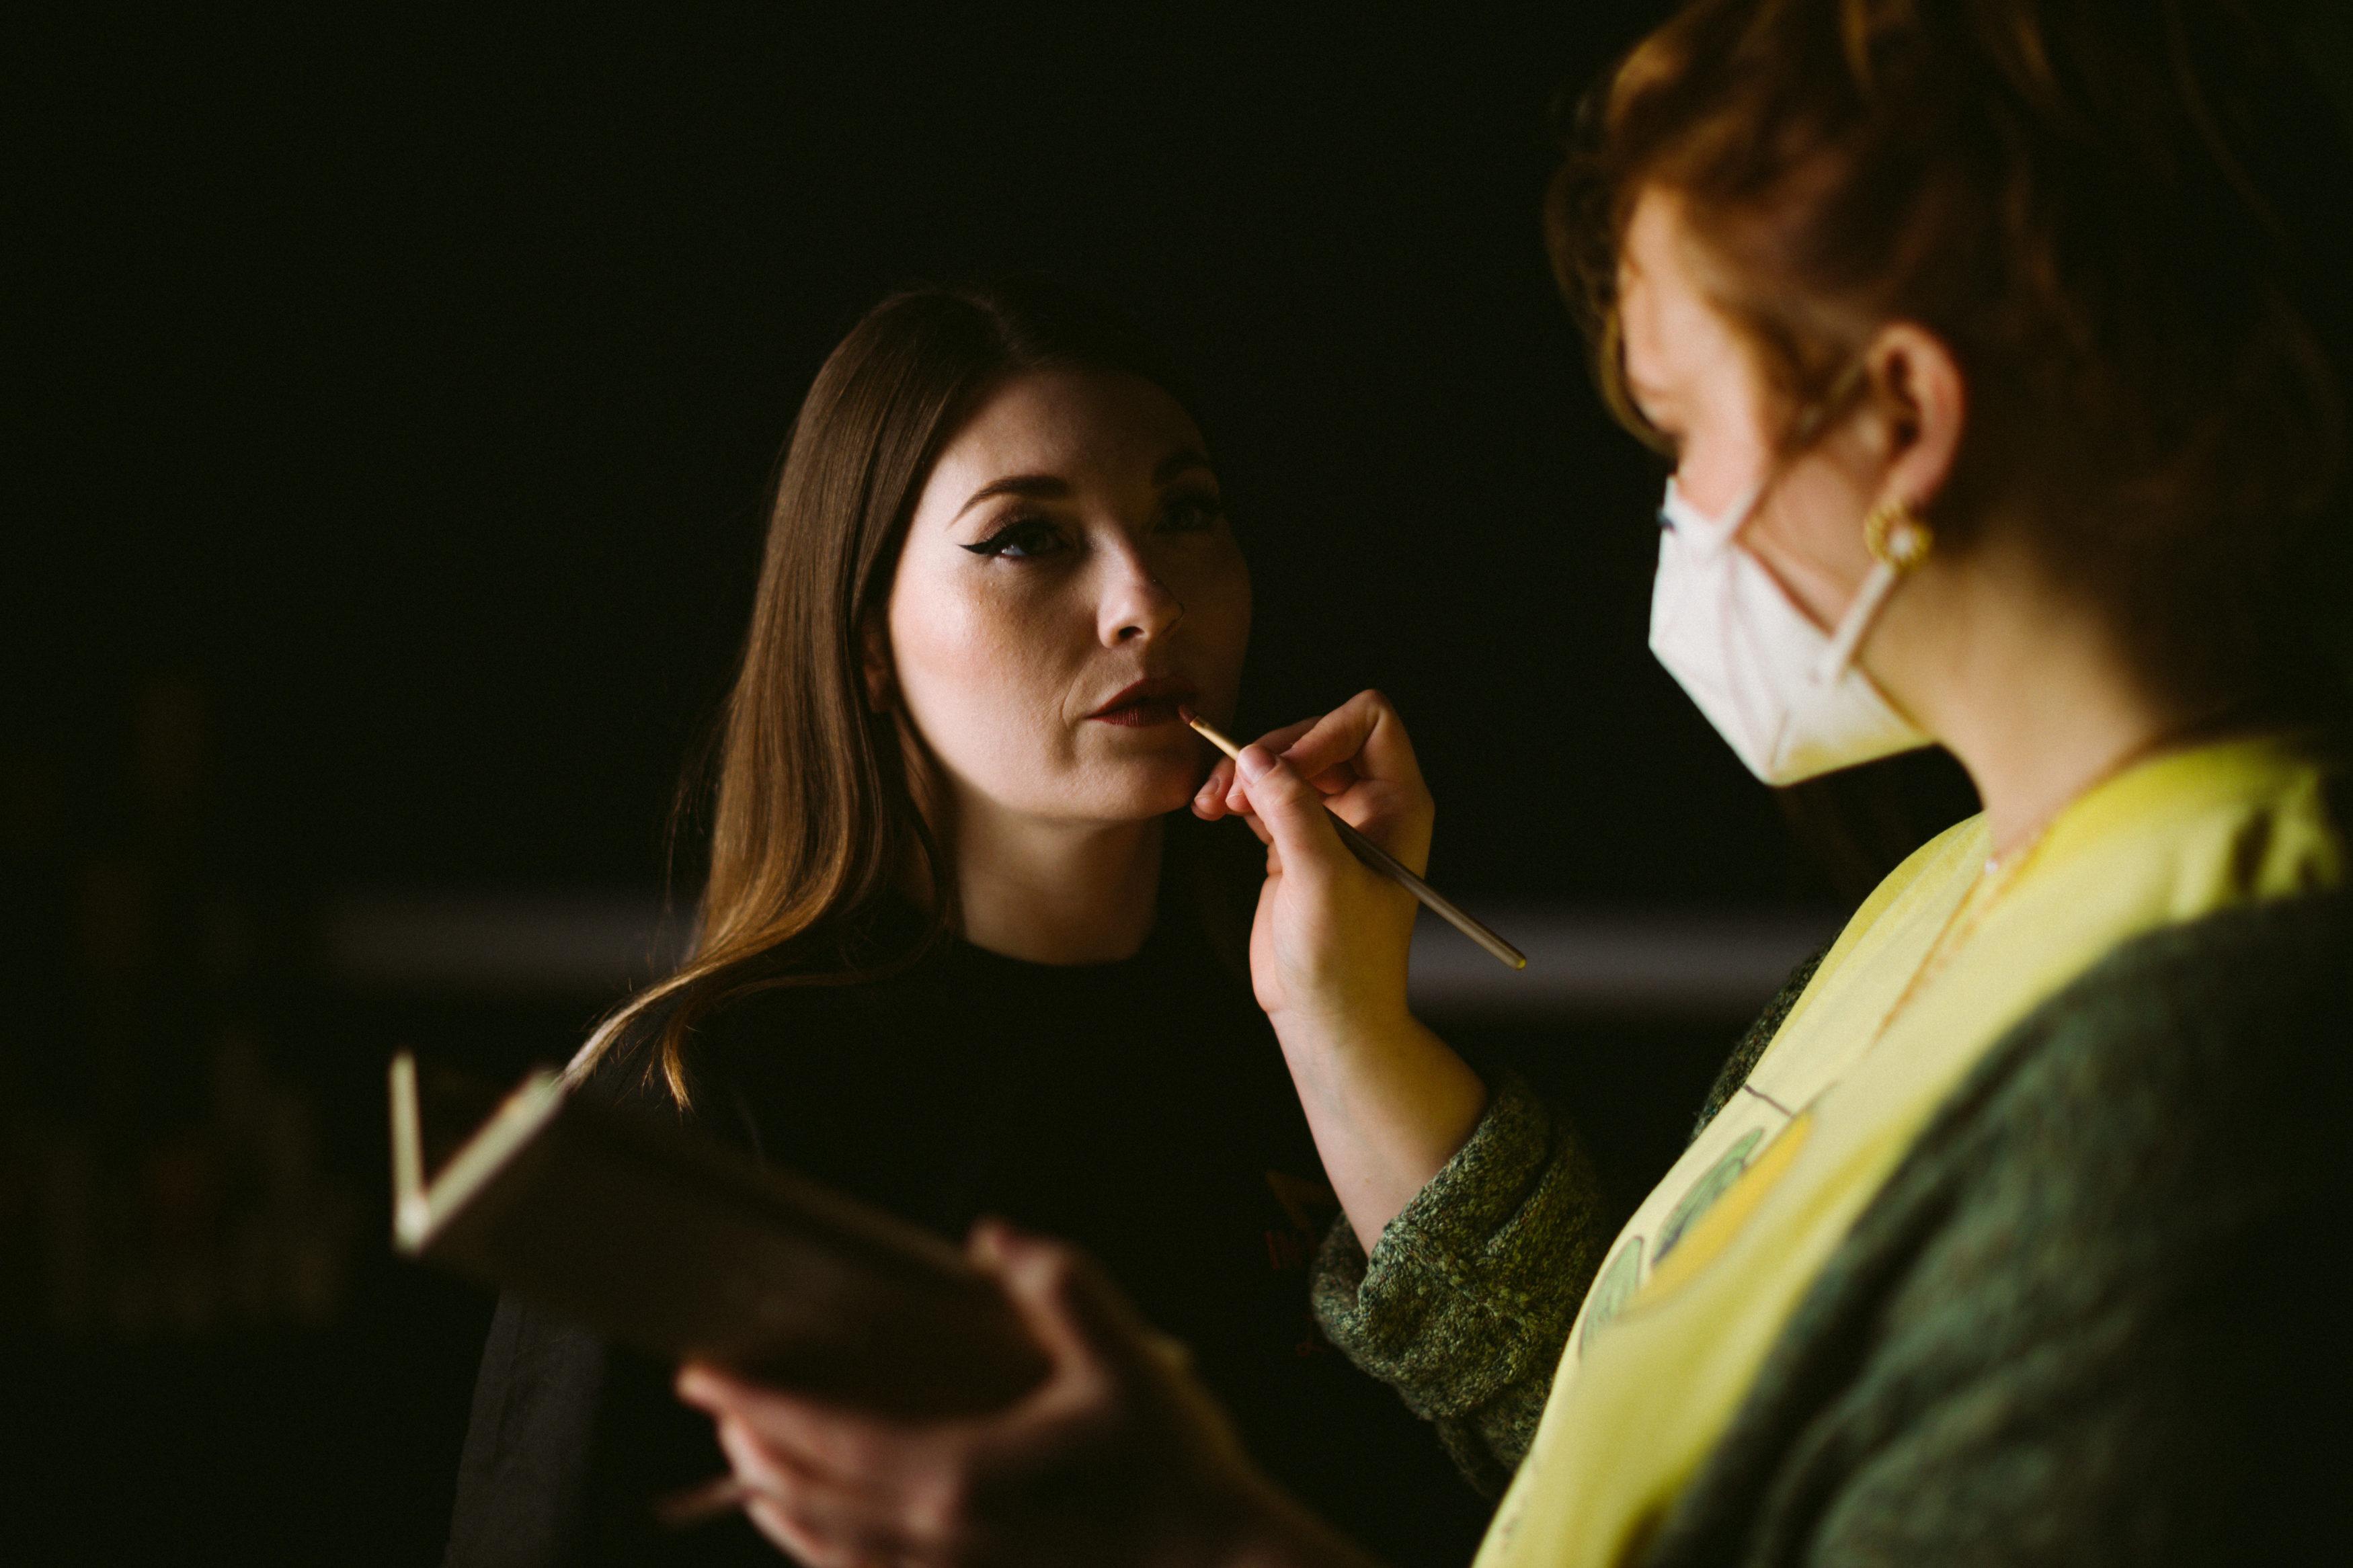 Makeup artist doing make up on a woman